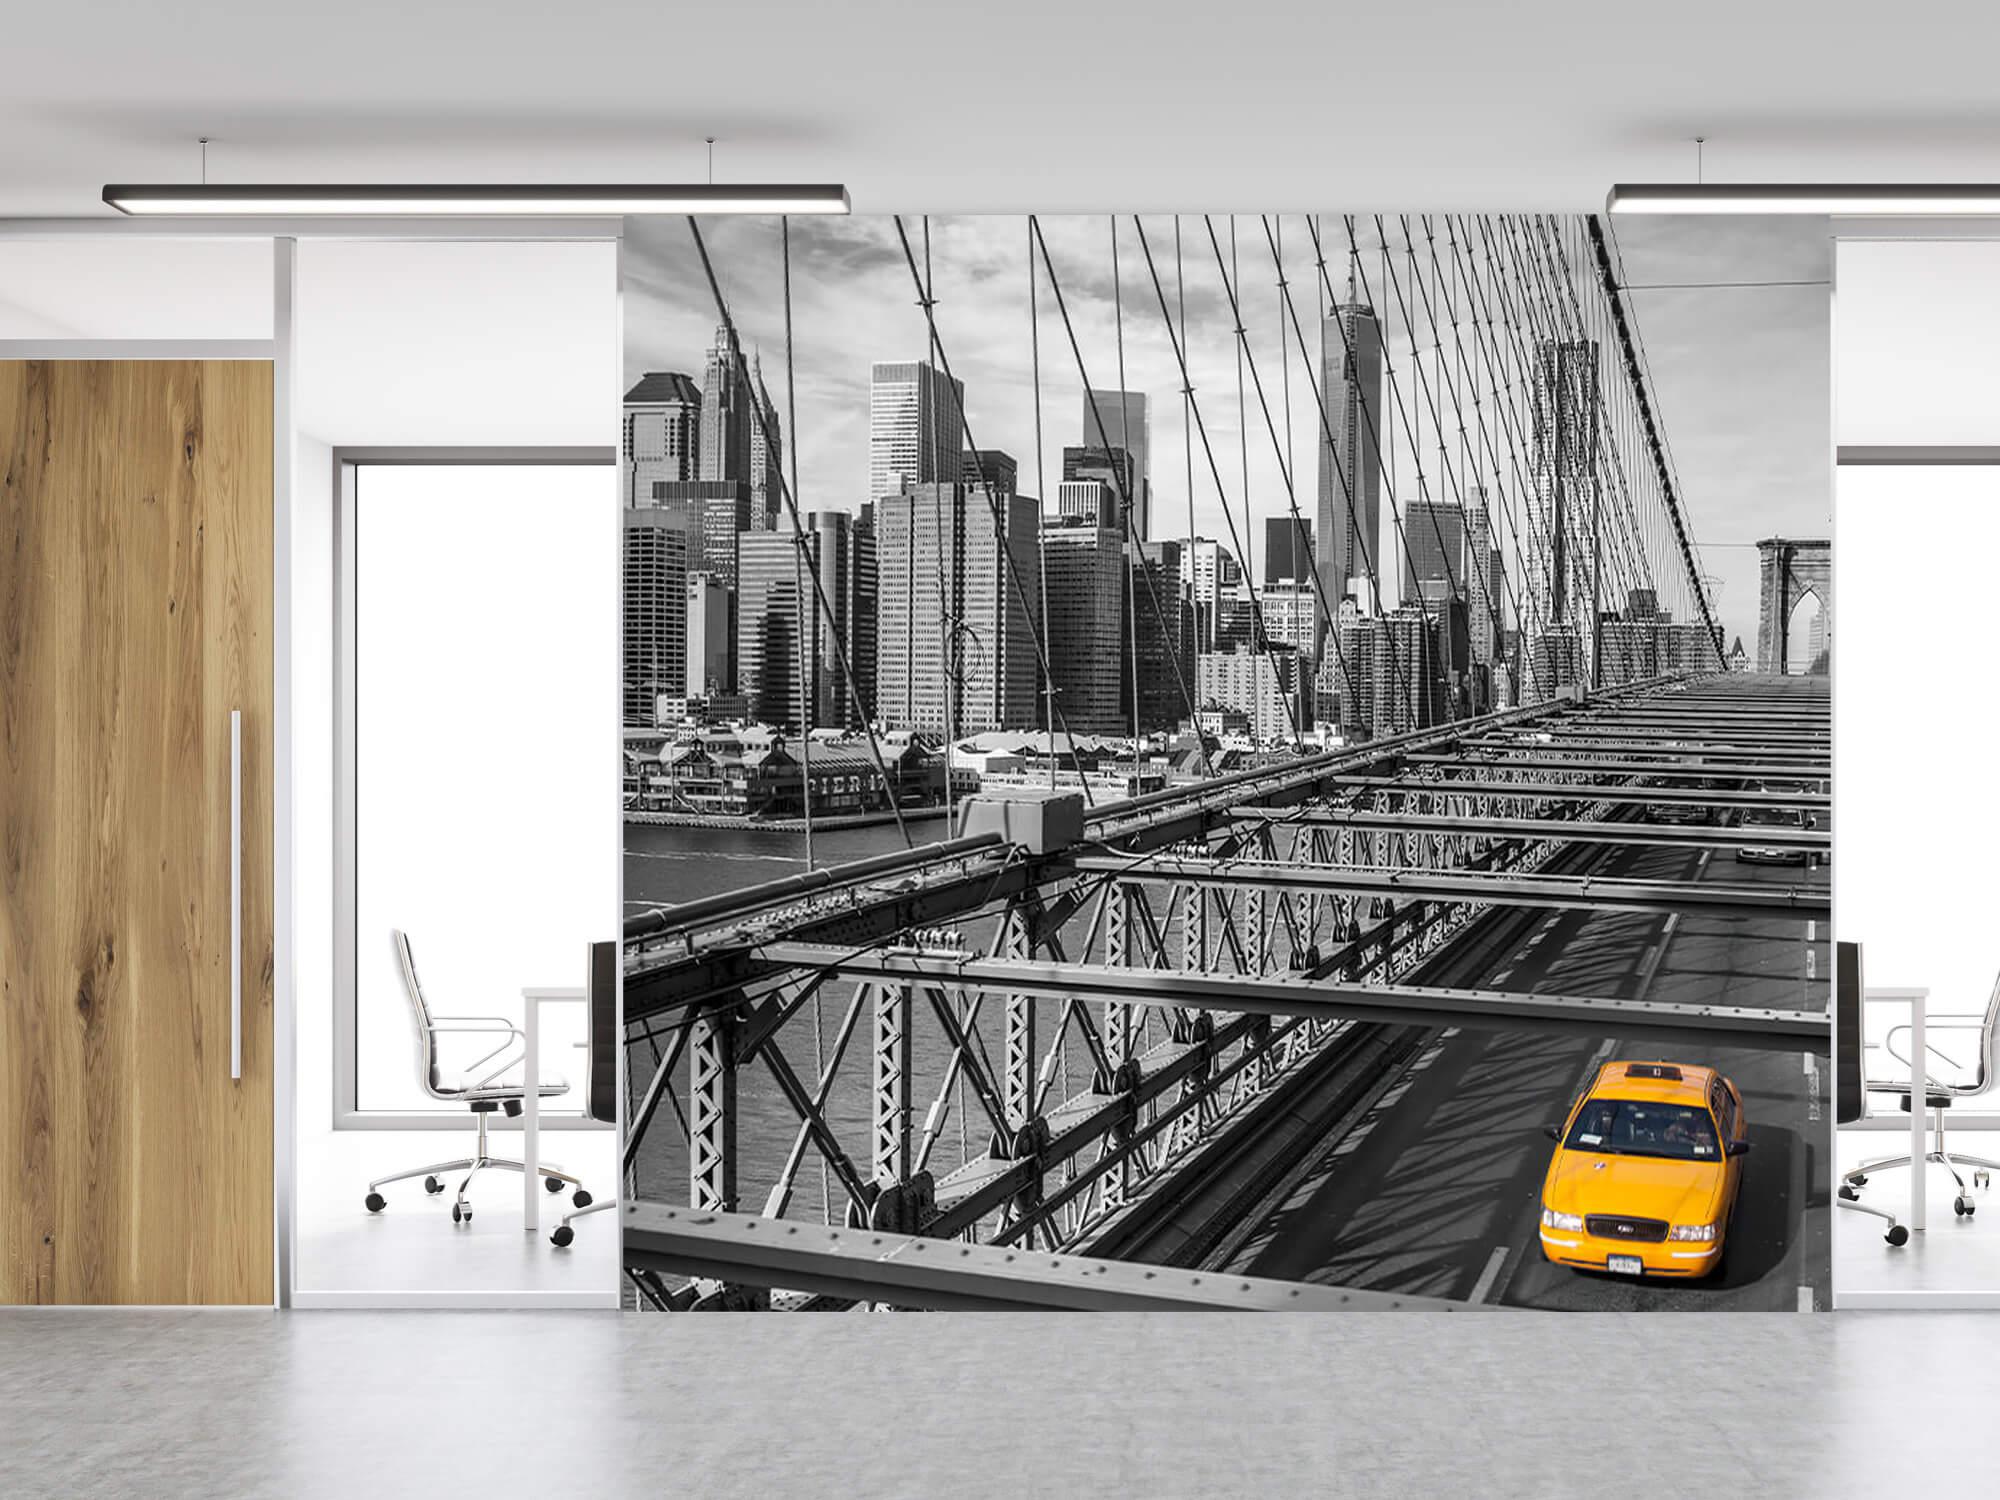 Un taxi sur le pont de Brooklyn 8